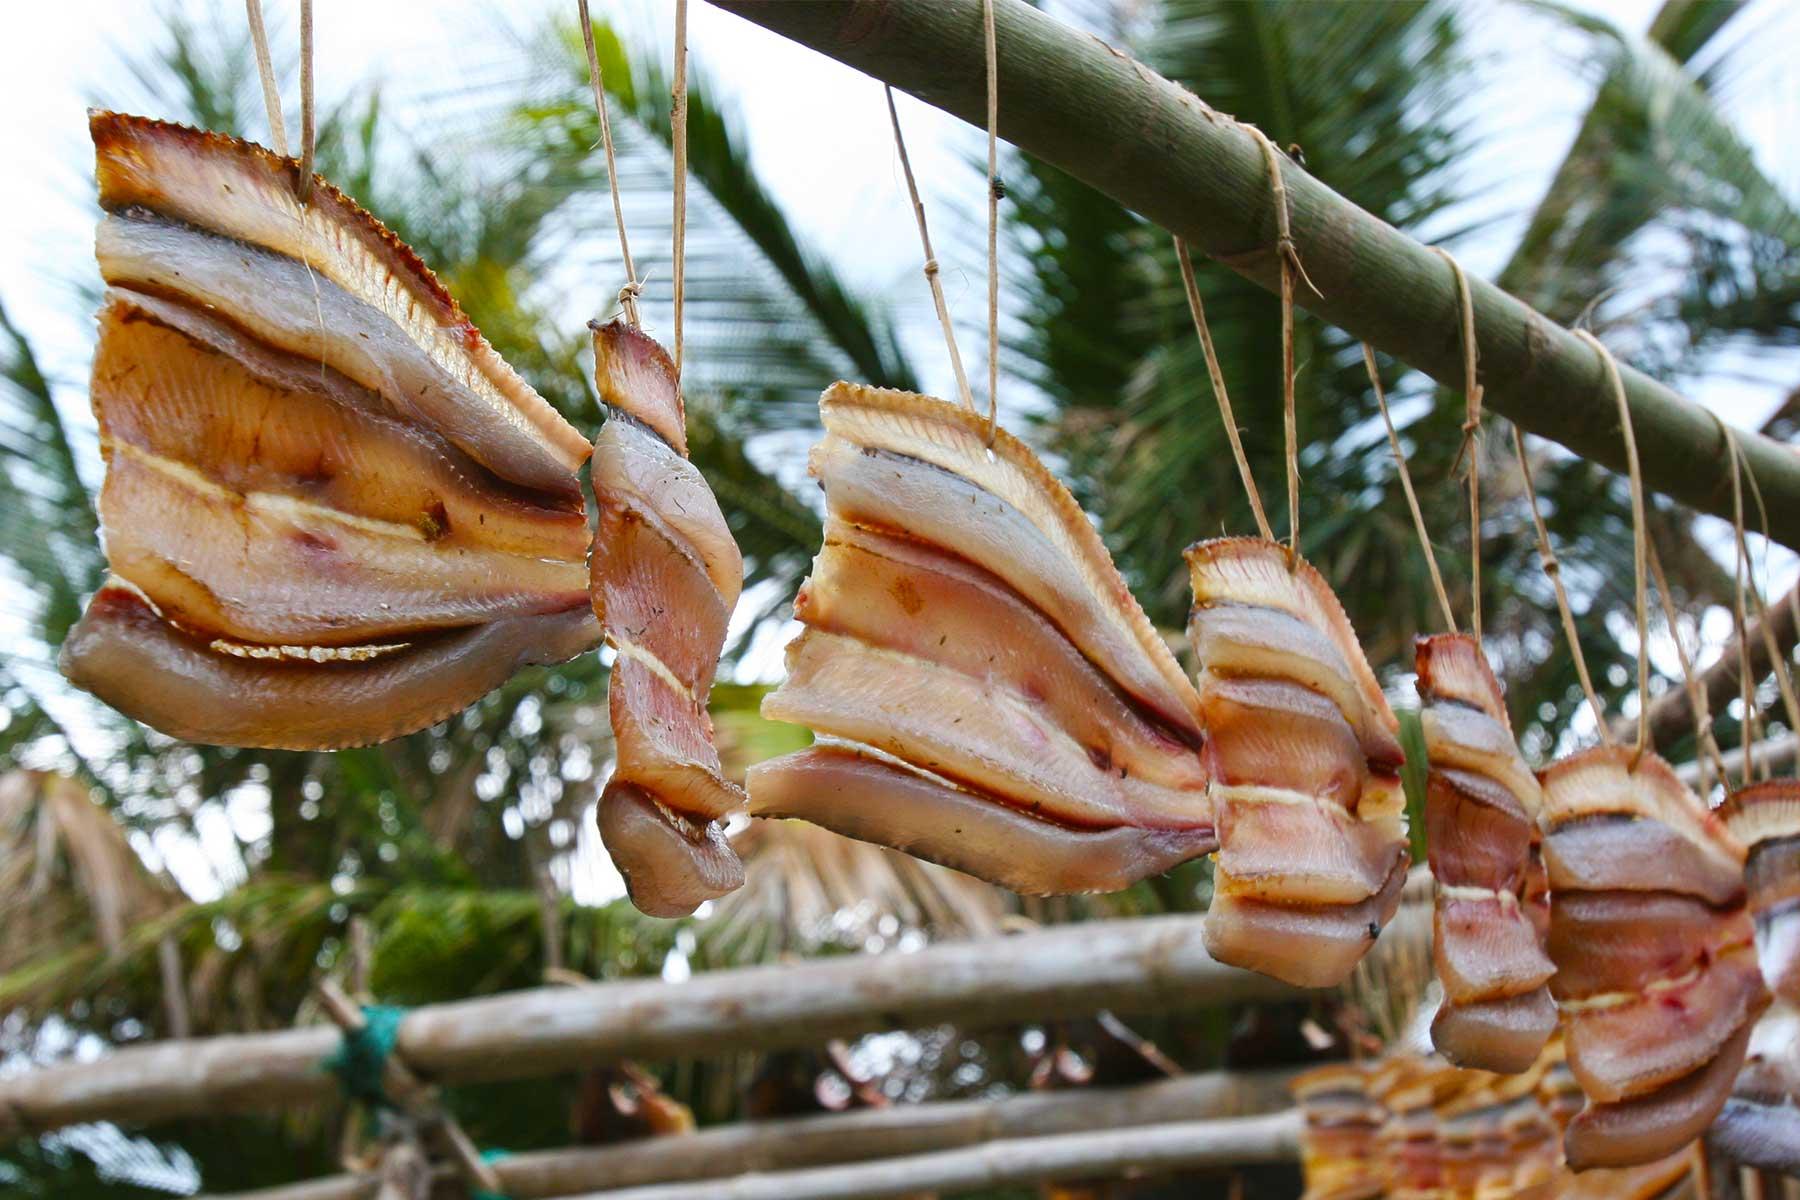 Drying fish - Batanes Islands Cultural Atlas - ECAI - Austronesian - Dr Steven Andrew Martin - Philippines research